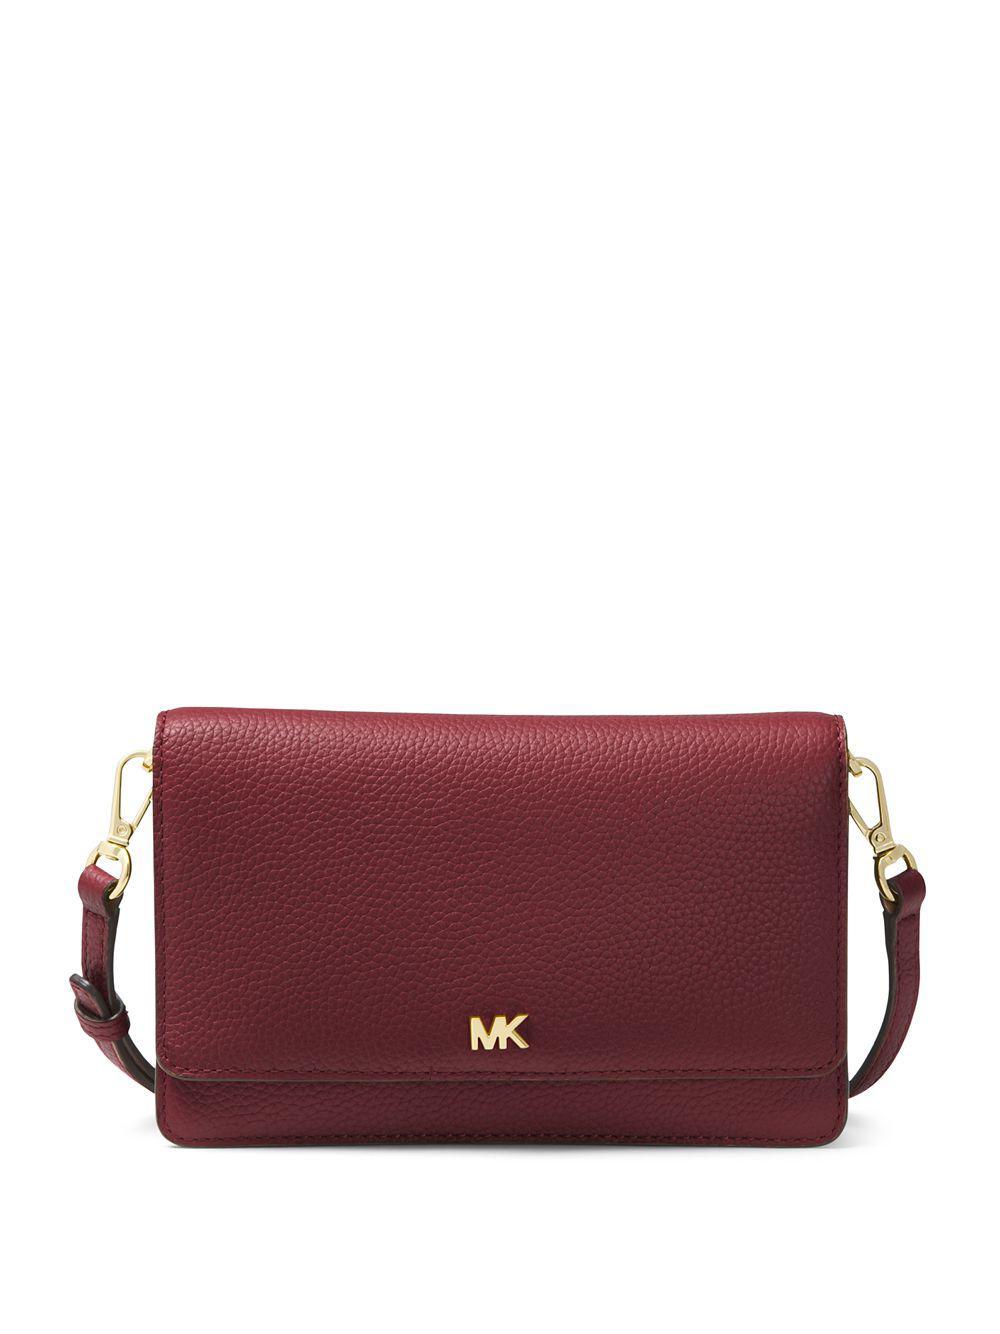 8a3a65636d96 MICHAEL Michael Kors. Women s Purple Pebbled Leather Convertible Crossbody  Bag